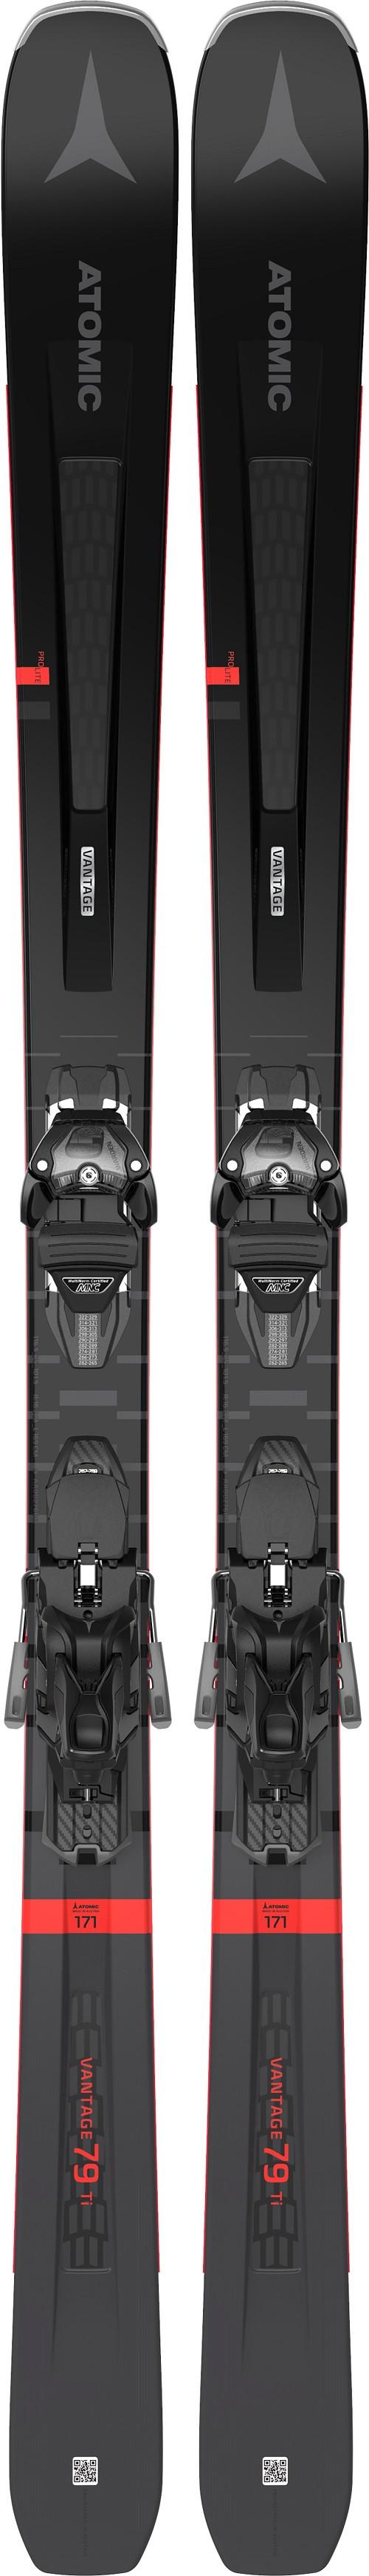 ESQUI VANTAGE 79 TI + F 12 GW